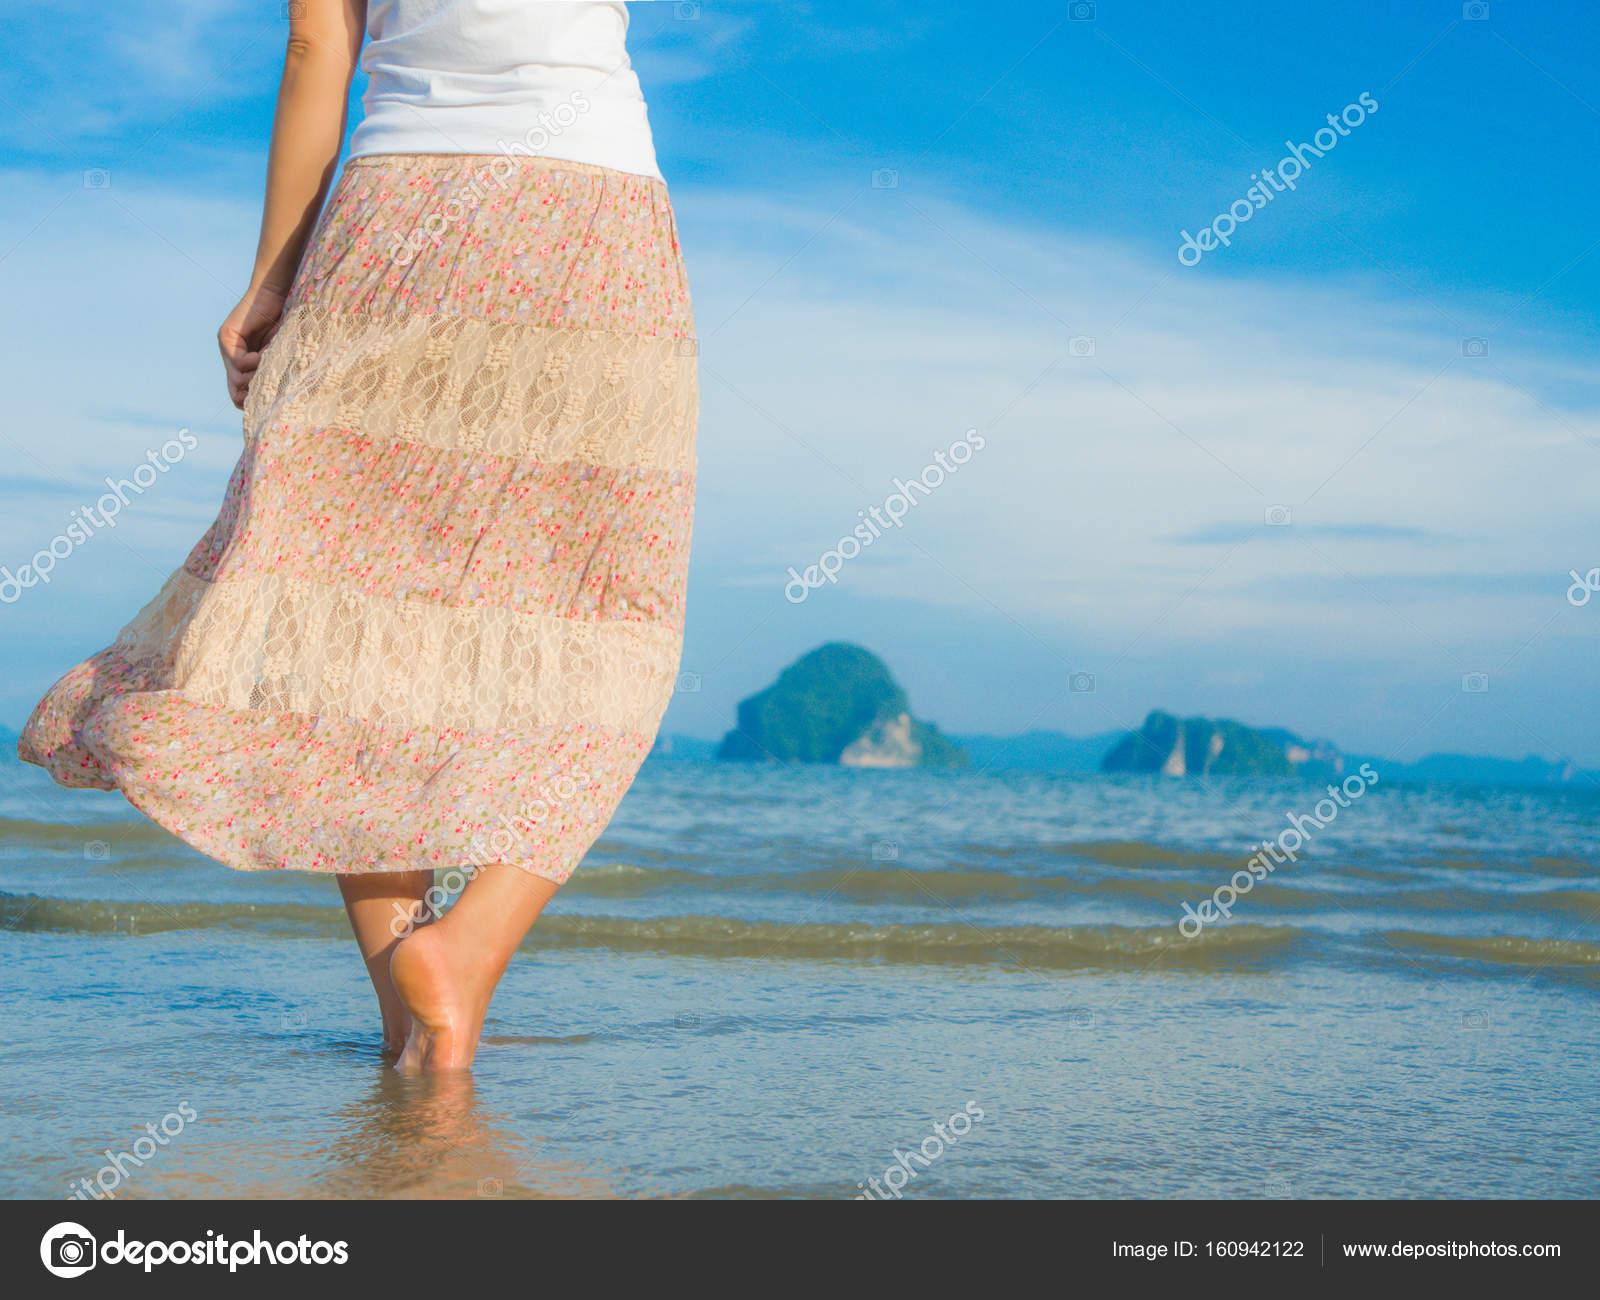 d0f53525aa Παραλία ταξίδια - γυναίκα που περπατά στην παραλία με άμμο. Λεπτομέρεια  closeup γυναικεία πόδια.